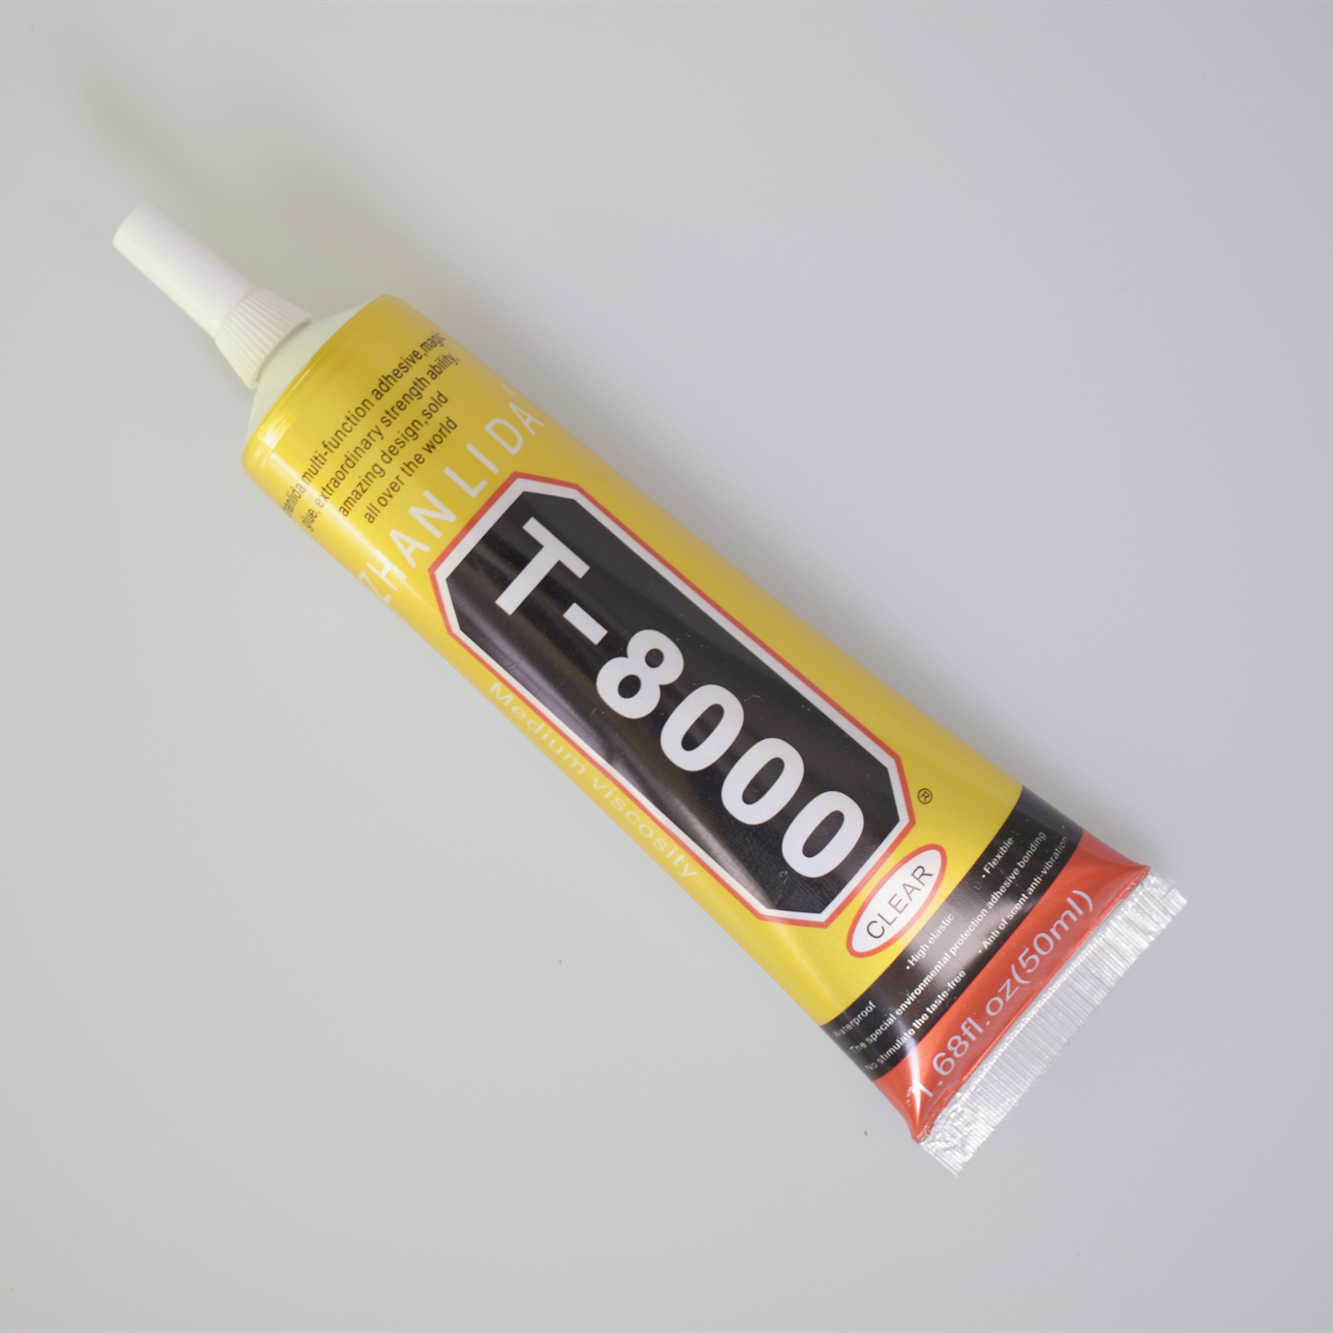 1 Pcs 50ml T-8000 Glue T8000 Multi Purpose Glue Adhesive Epoxy Resin Repair Cell Phone LCD Touch Screen Super Glue T 8000